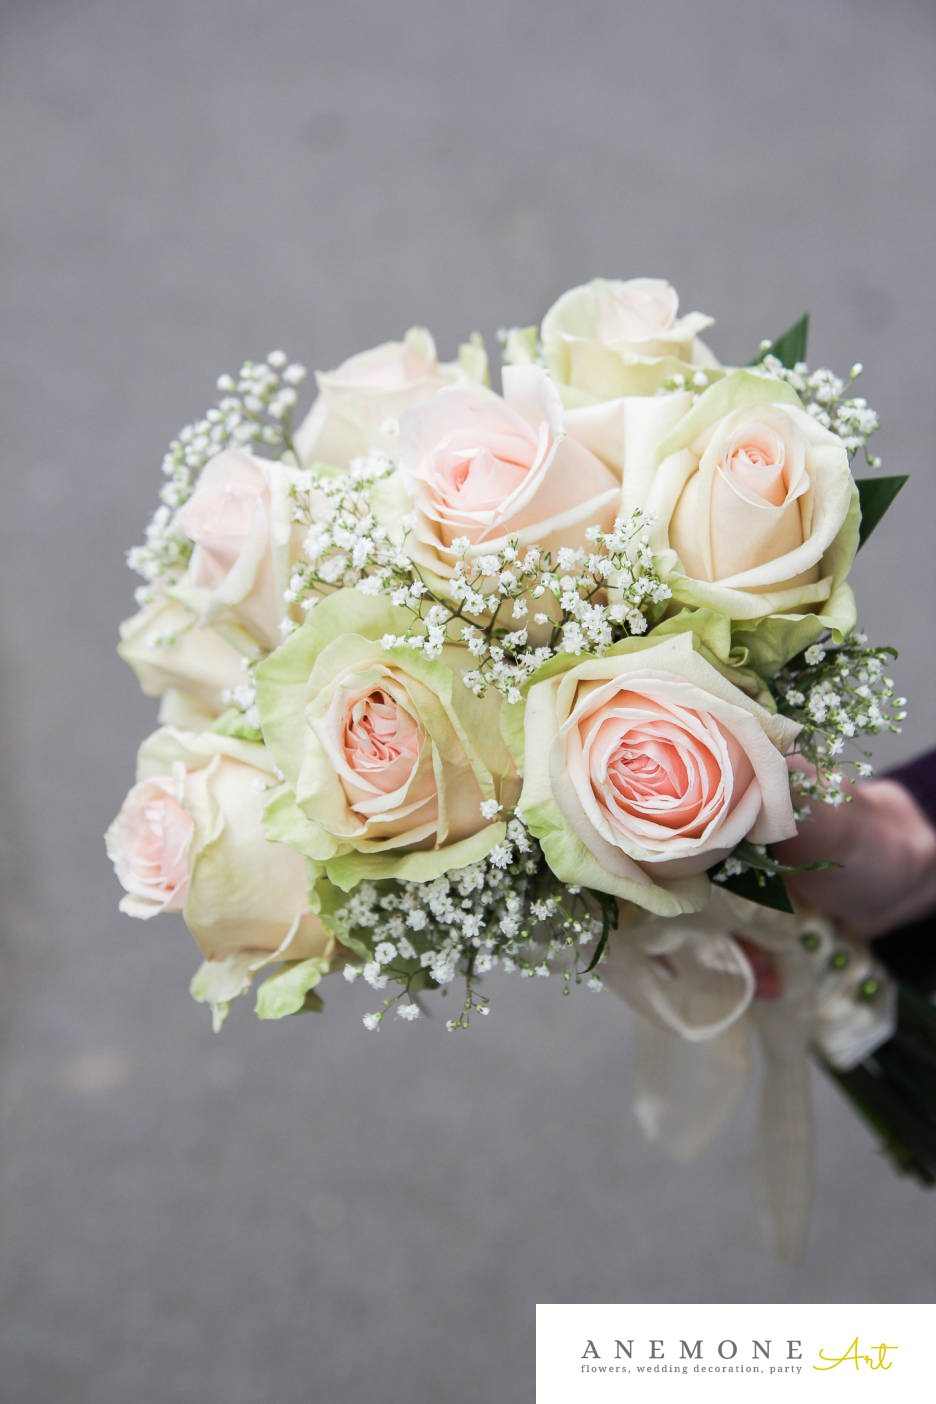 Poza, foto cu Flori de nunta alb, buchet domnisoara, gipsofila, roz, trandafiri in Arad, Timisoara, Oradea (wedding flowers, bouquets) nunta Arad, Timisoara, Oradea